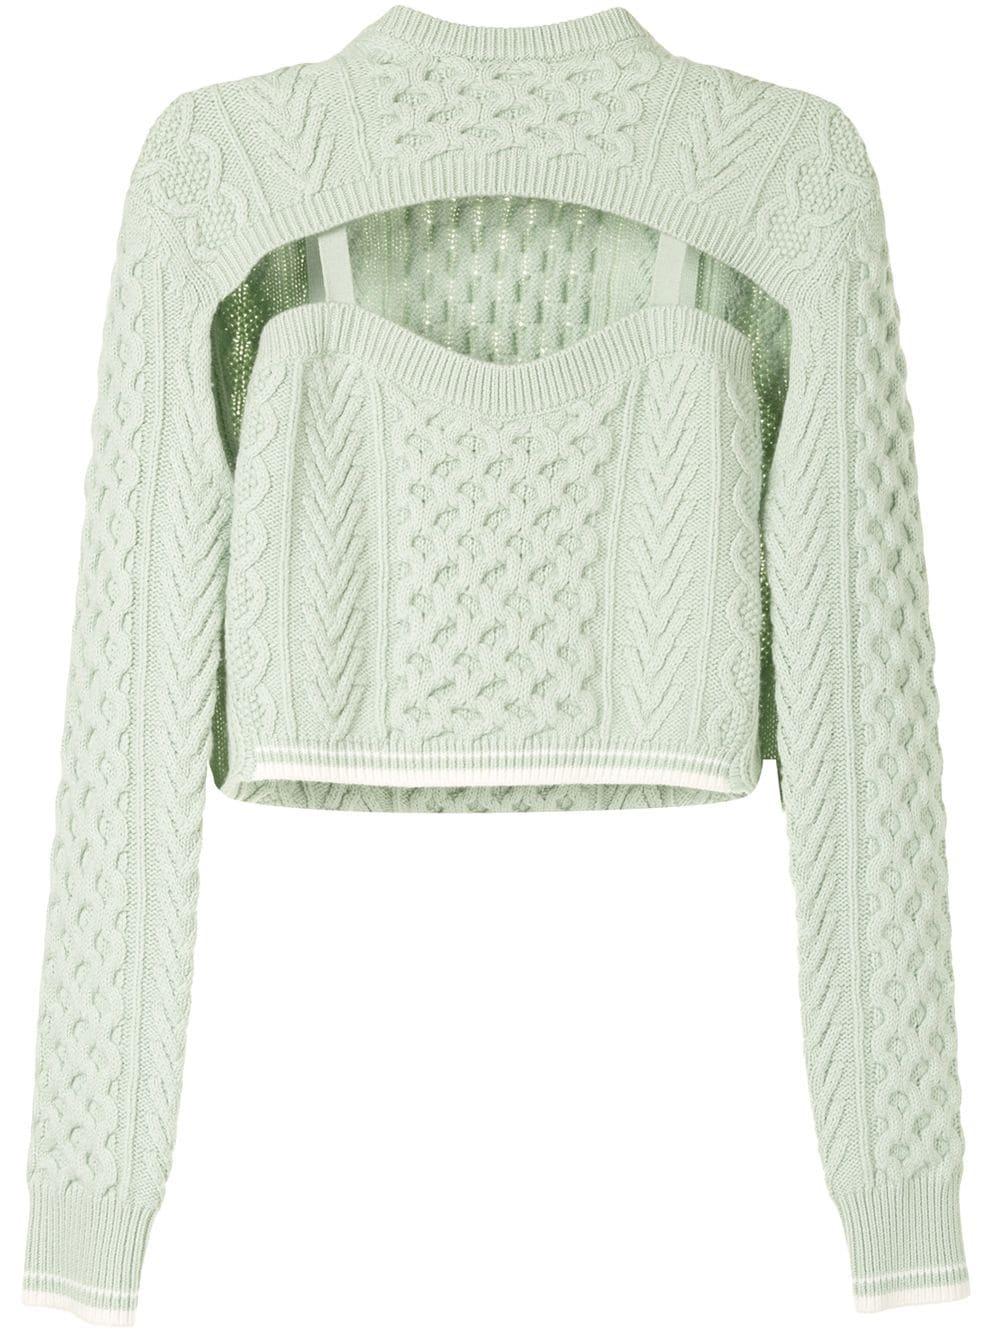 Rosie Assoulin Pullover mit Cut-Outs - Grün